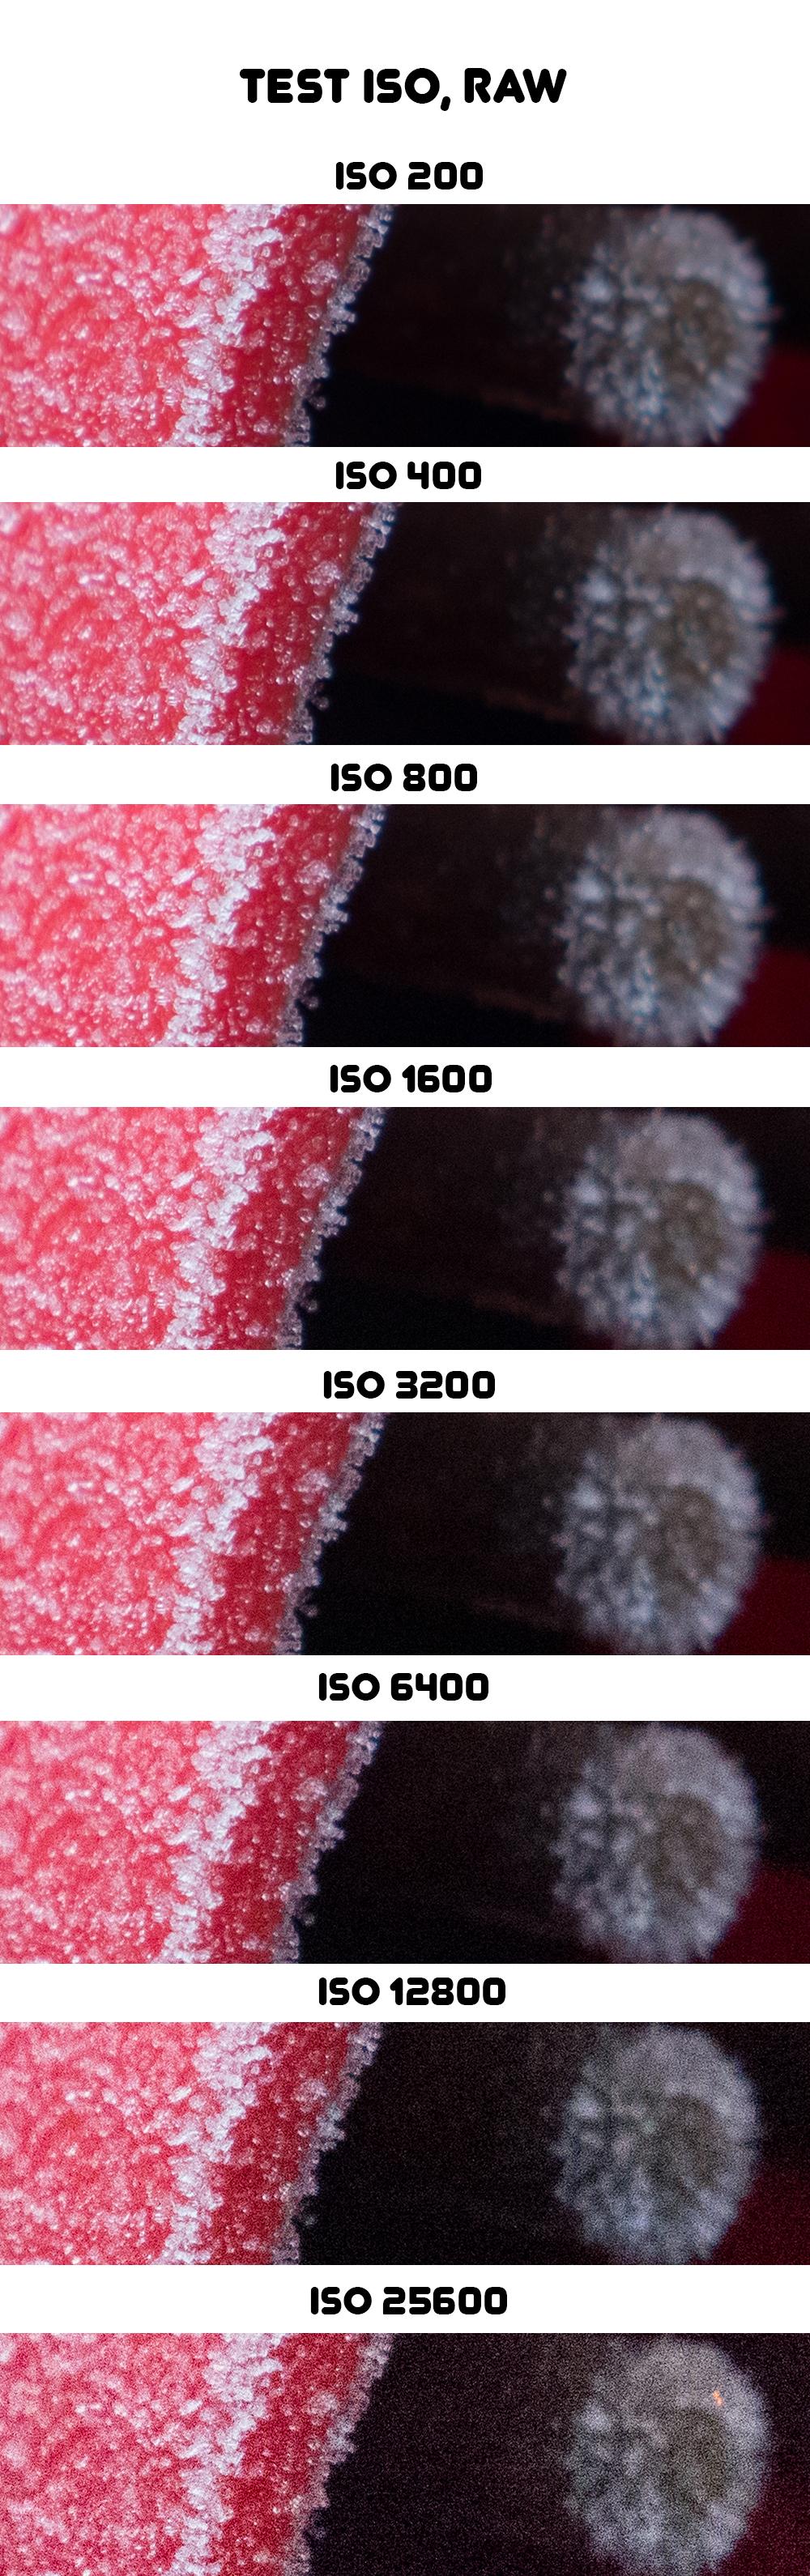 Panasonic Lumix GX7 - test ISO, RAW